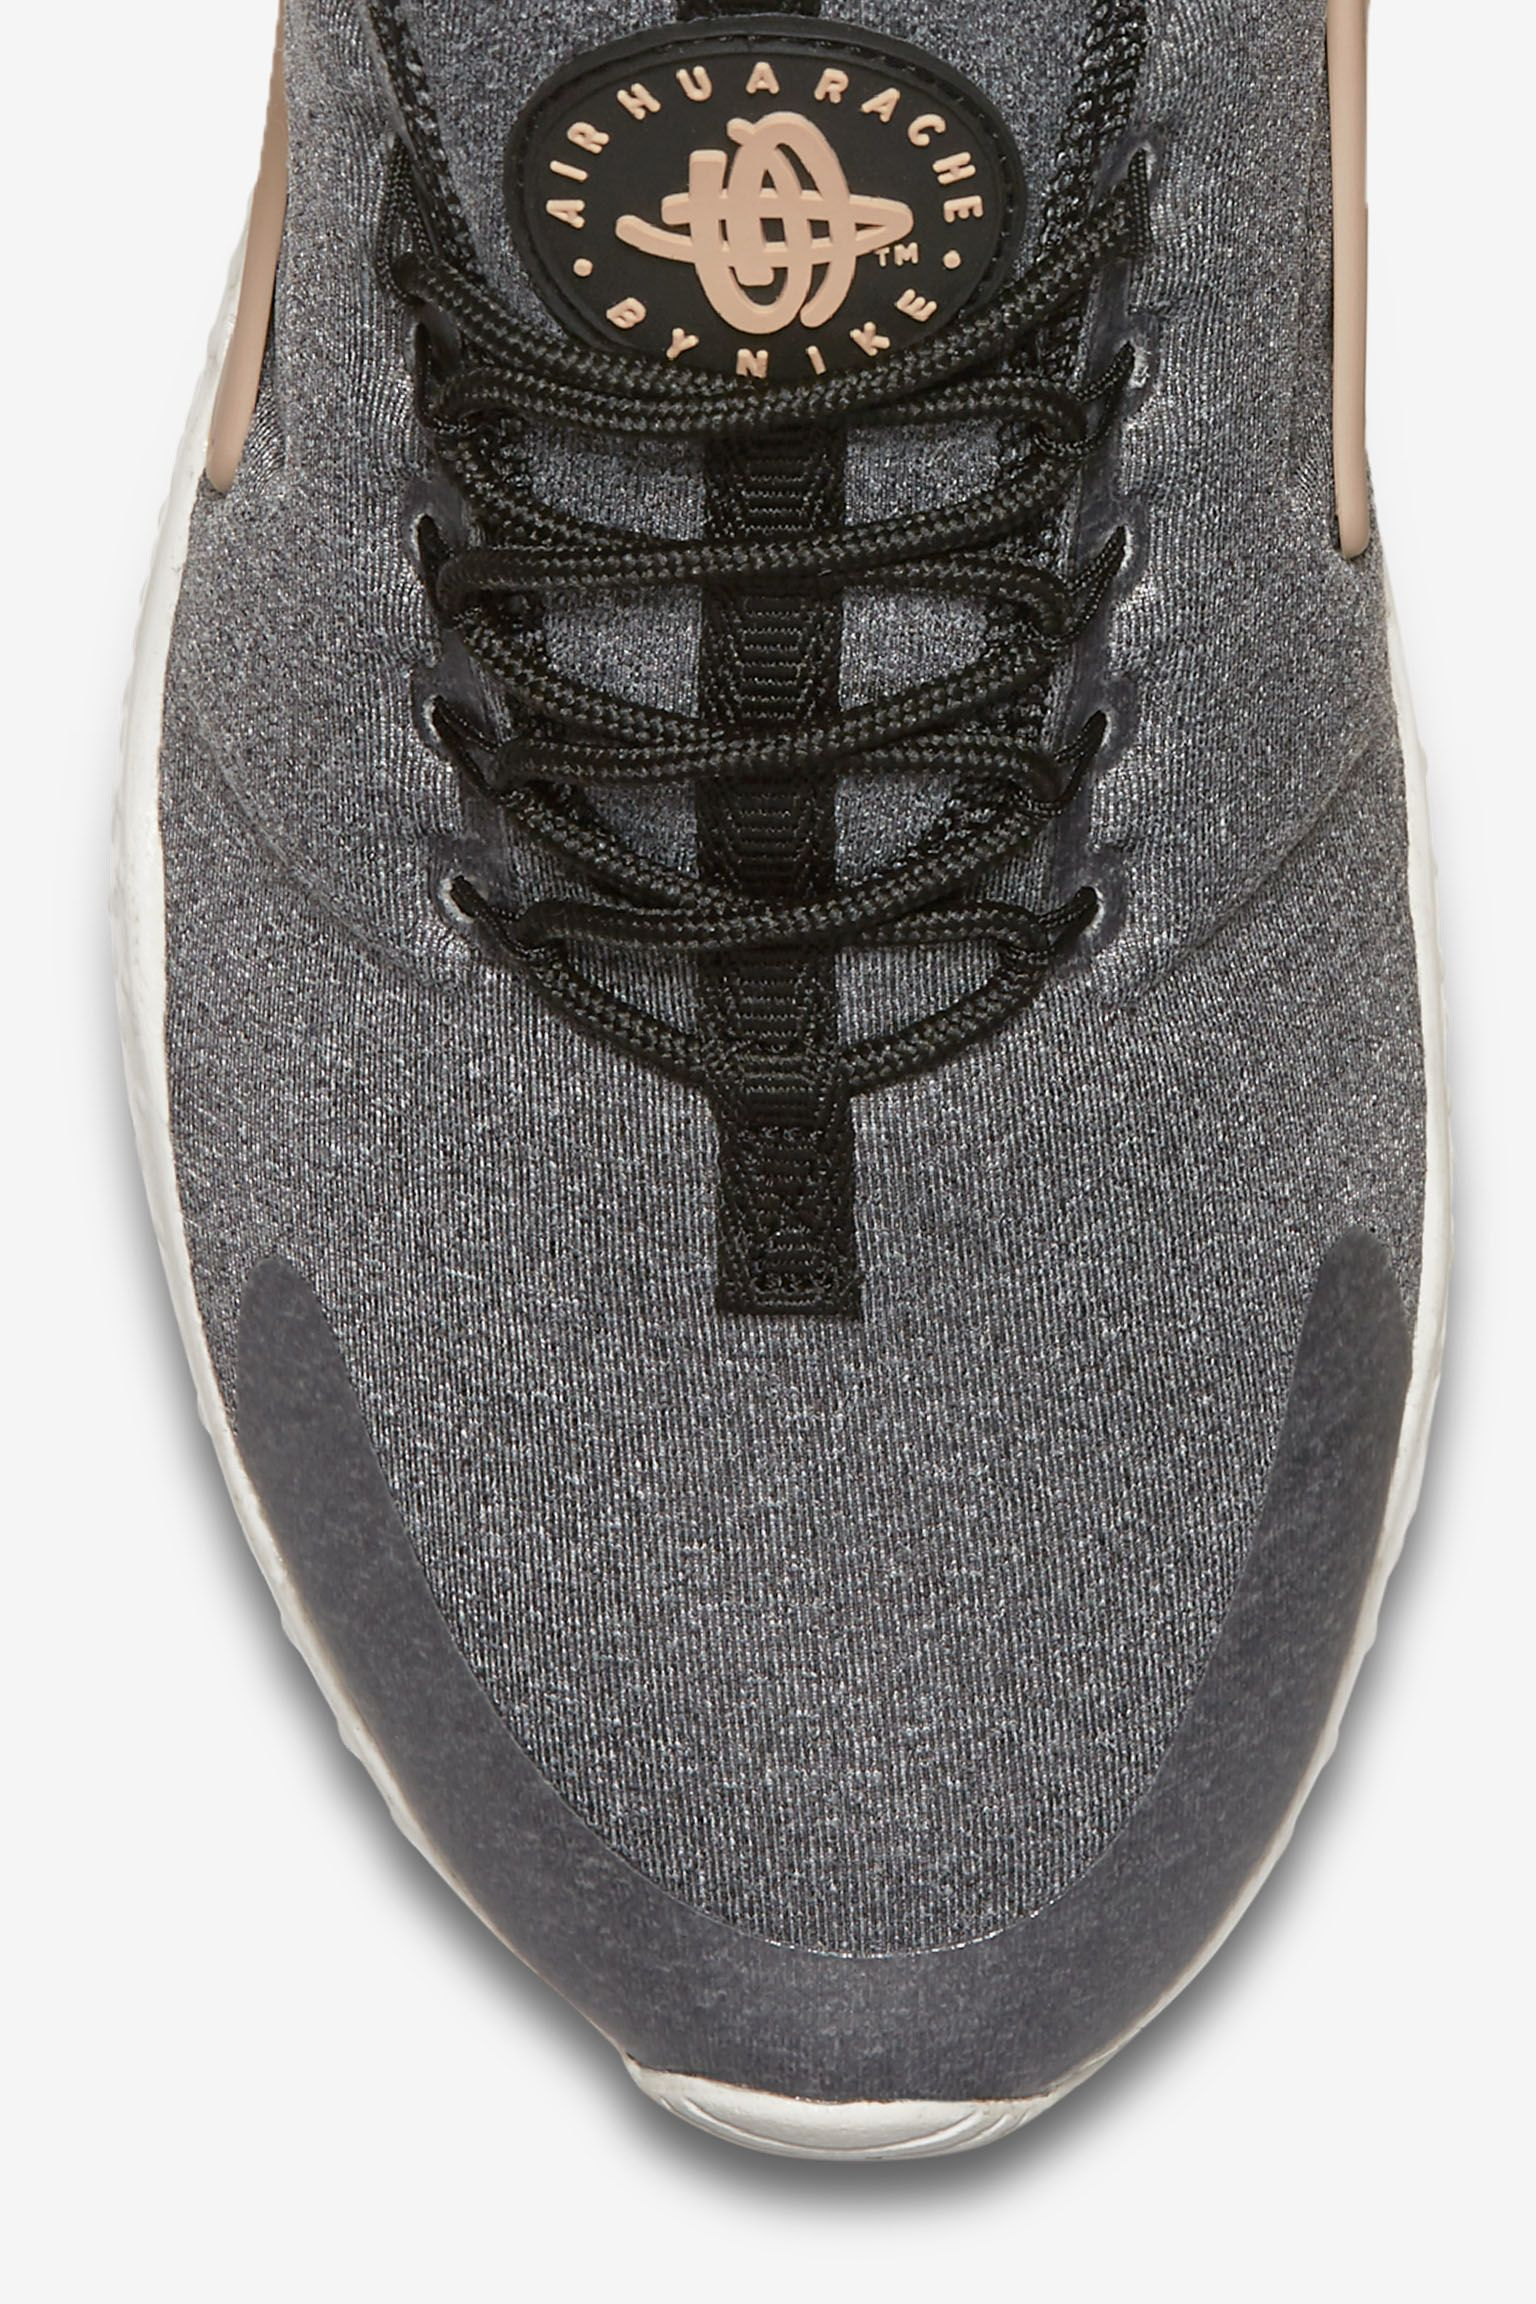 "Nike Air Huarache Ultra SE ""Black & Vachetta Tan"" - Donna"